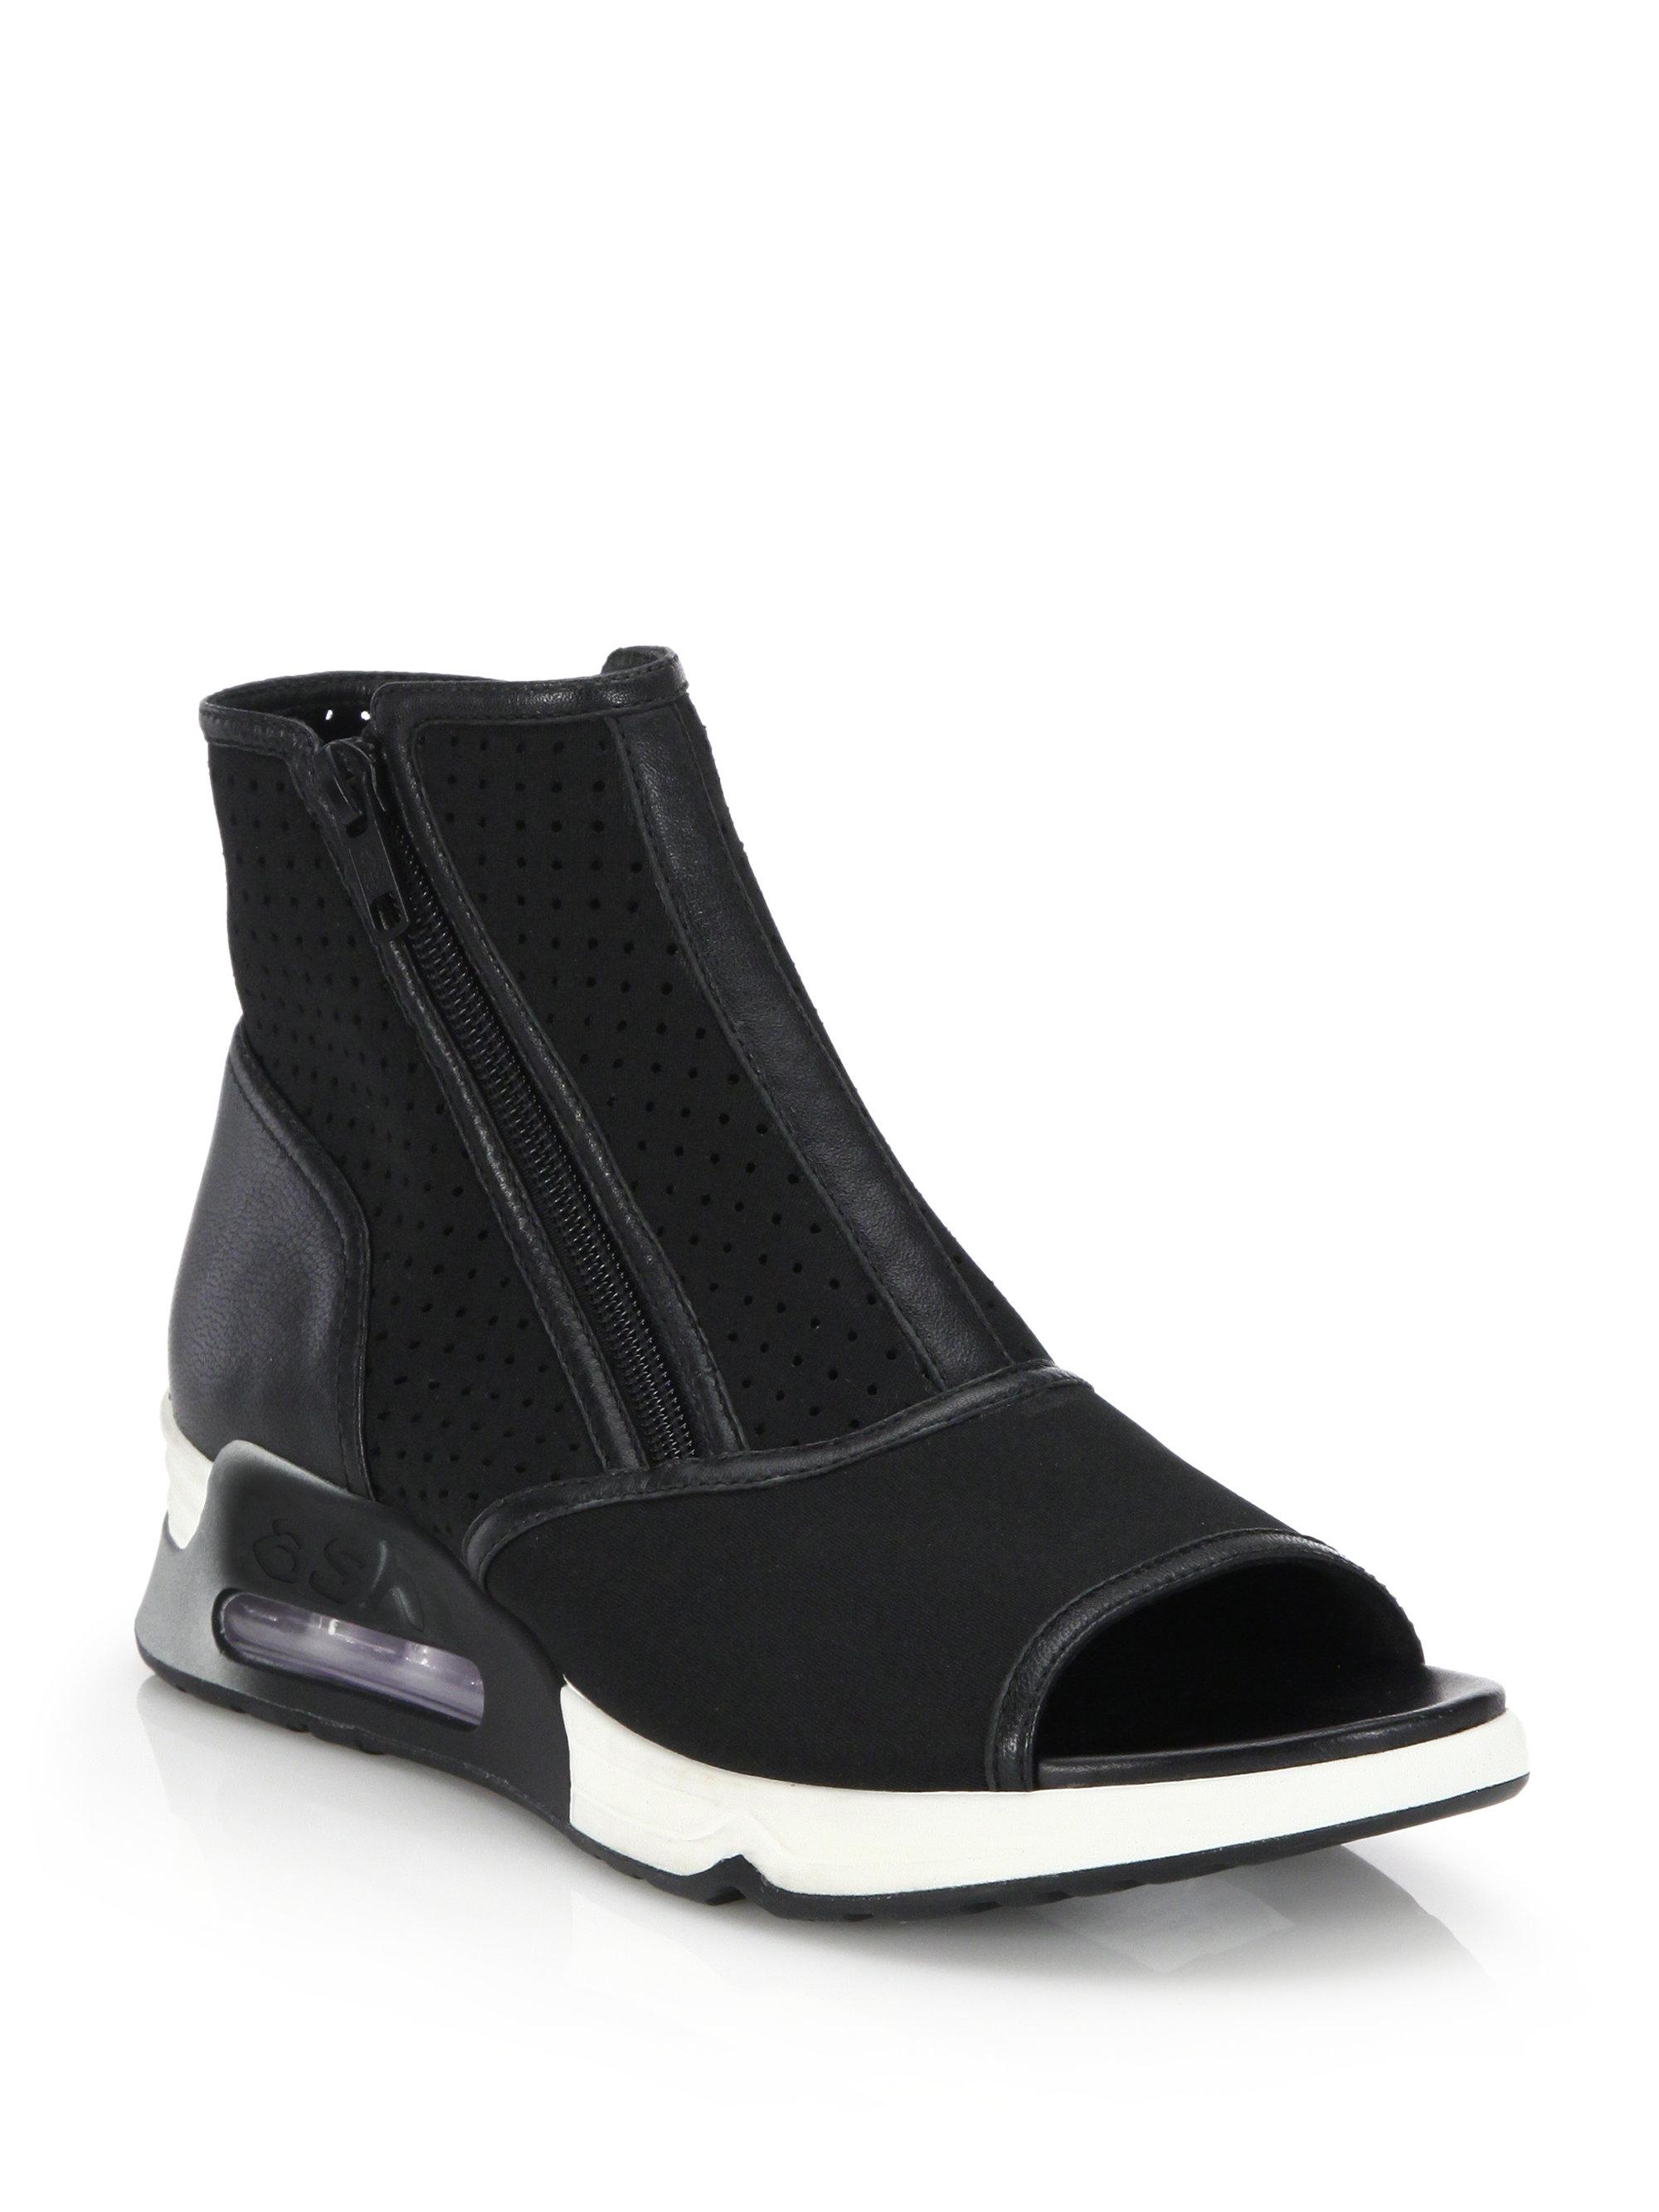 Ash Liv Perforated Peep Toe Wedge Sneakers In Black Lyst